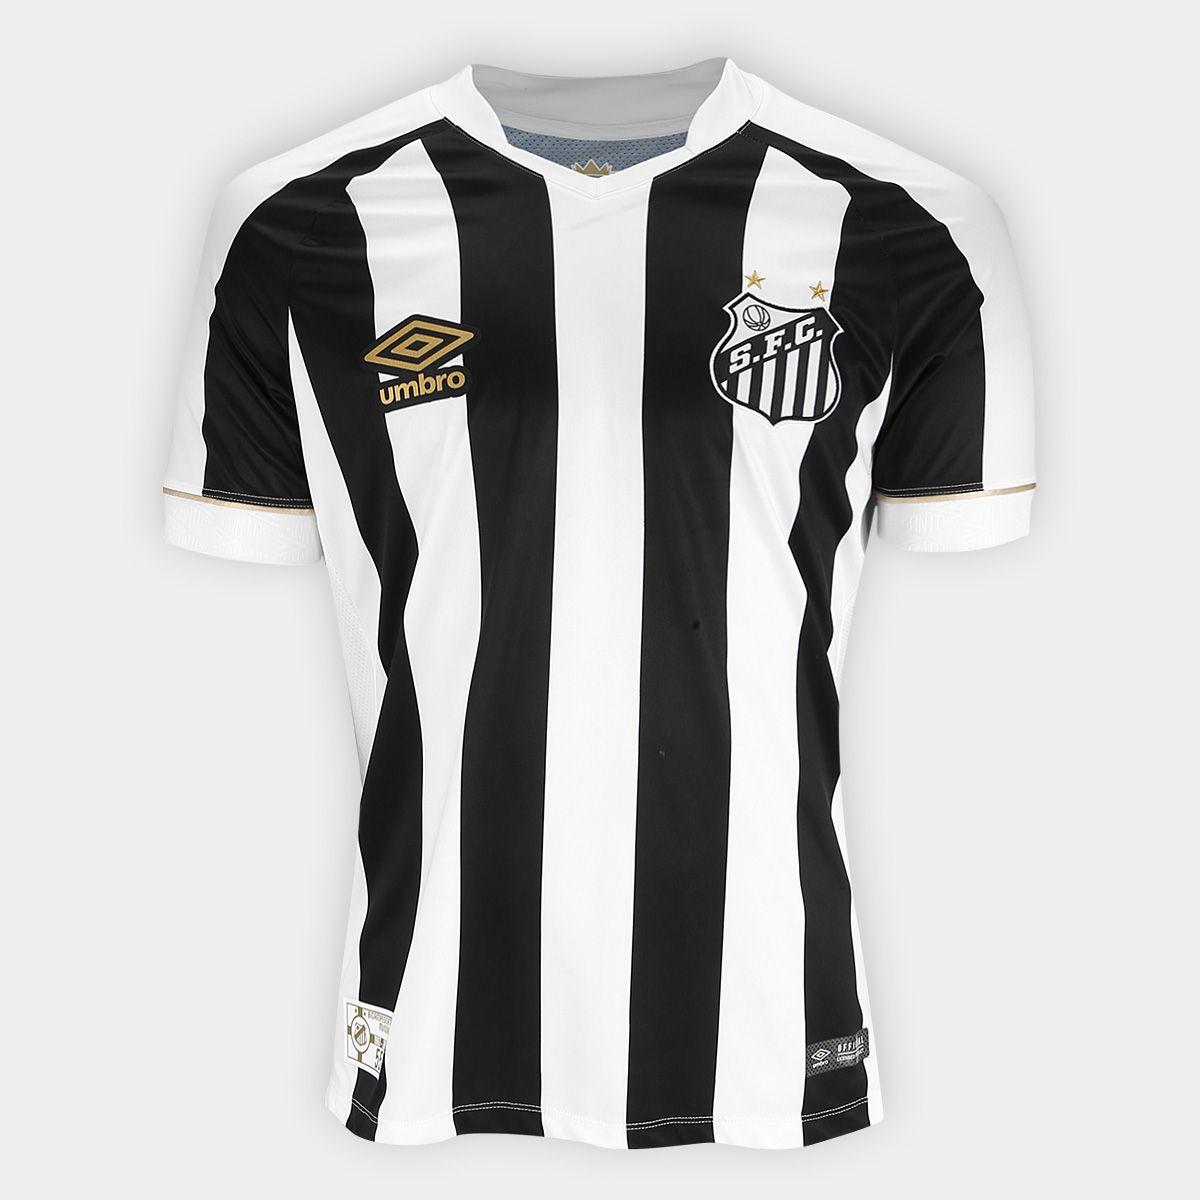 Camisa Santos Umbro Oficial II Masculina - Preta/Branca